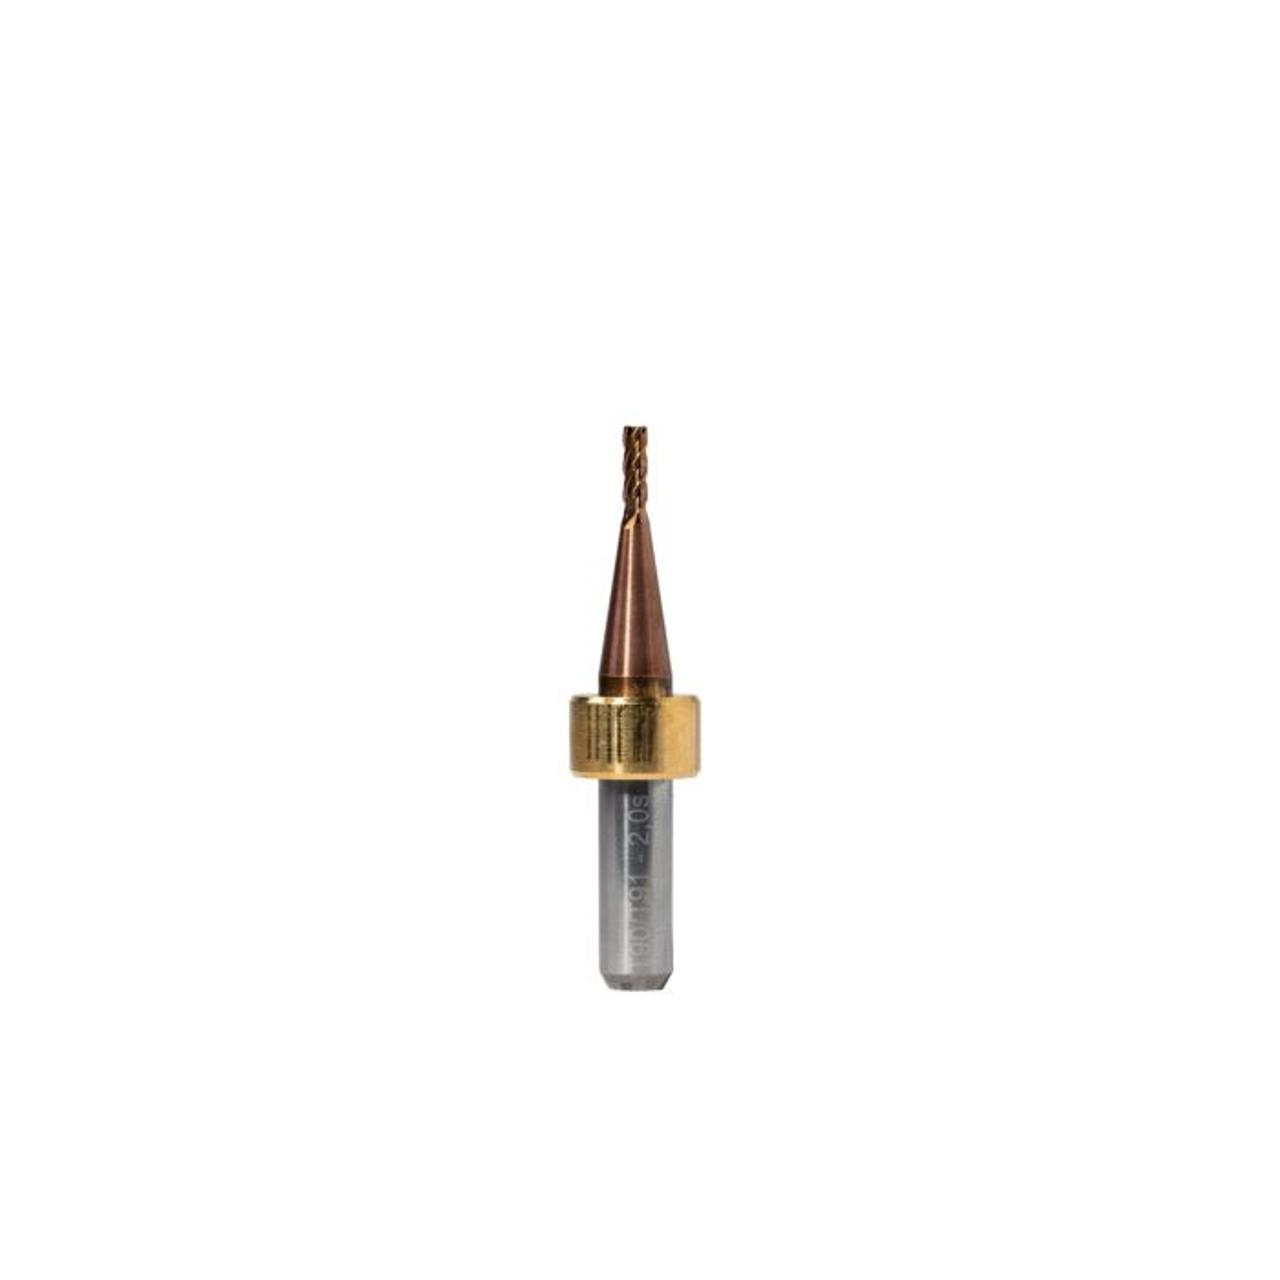 T67 - Shaft Milling Tool Short (1=7 mm, Four Blades)